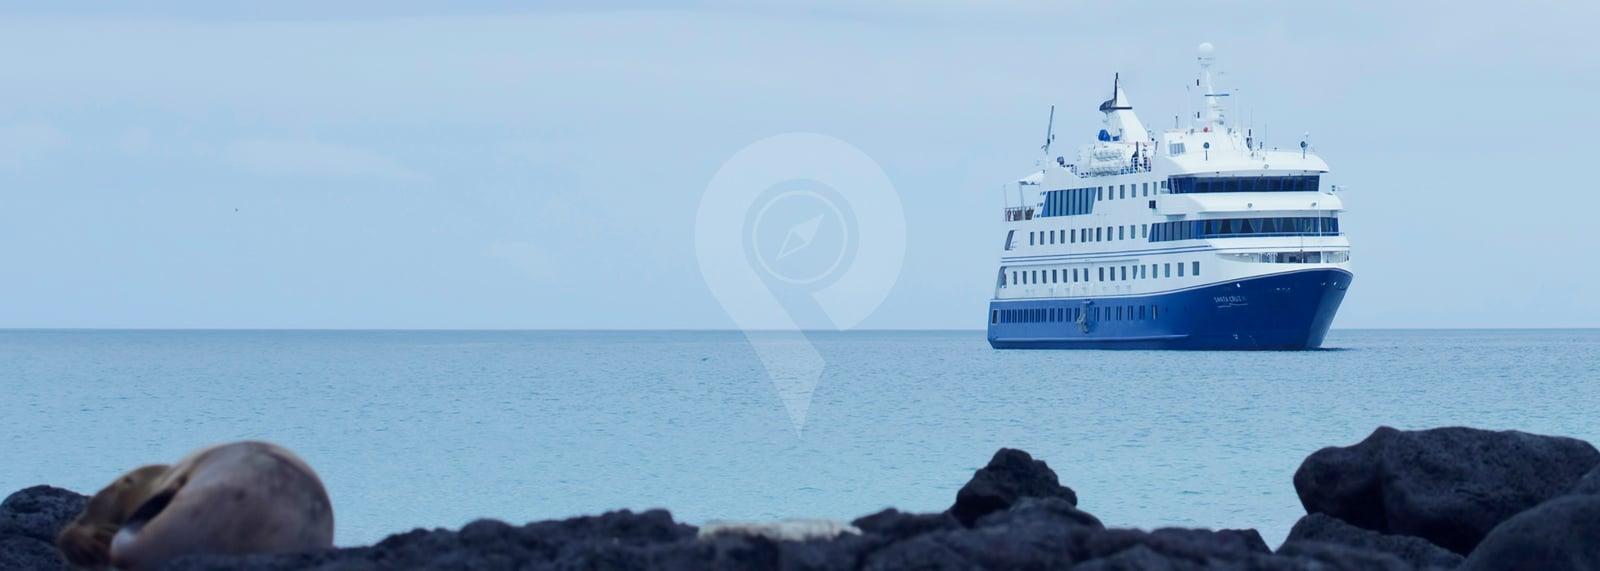 Santa Cruz 2 Galapagos Ship